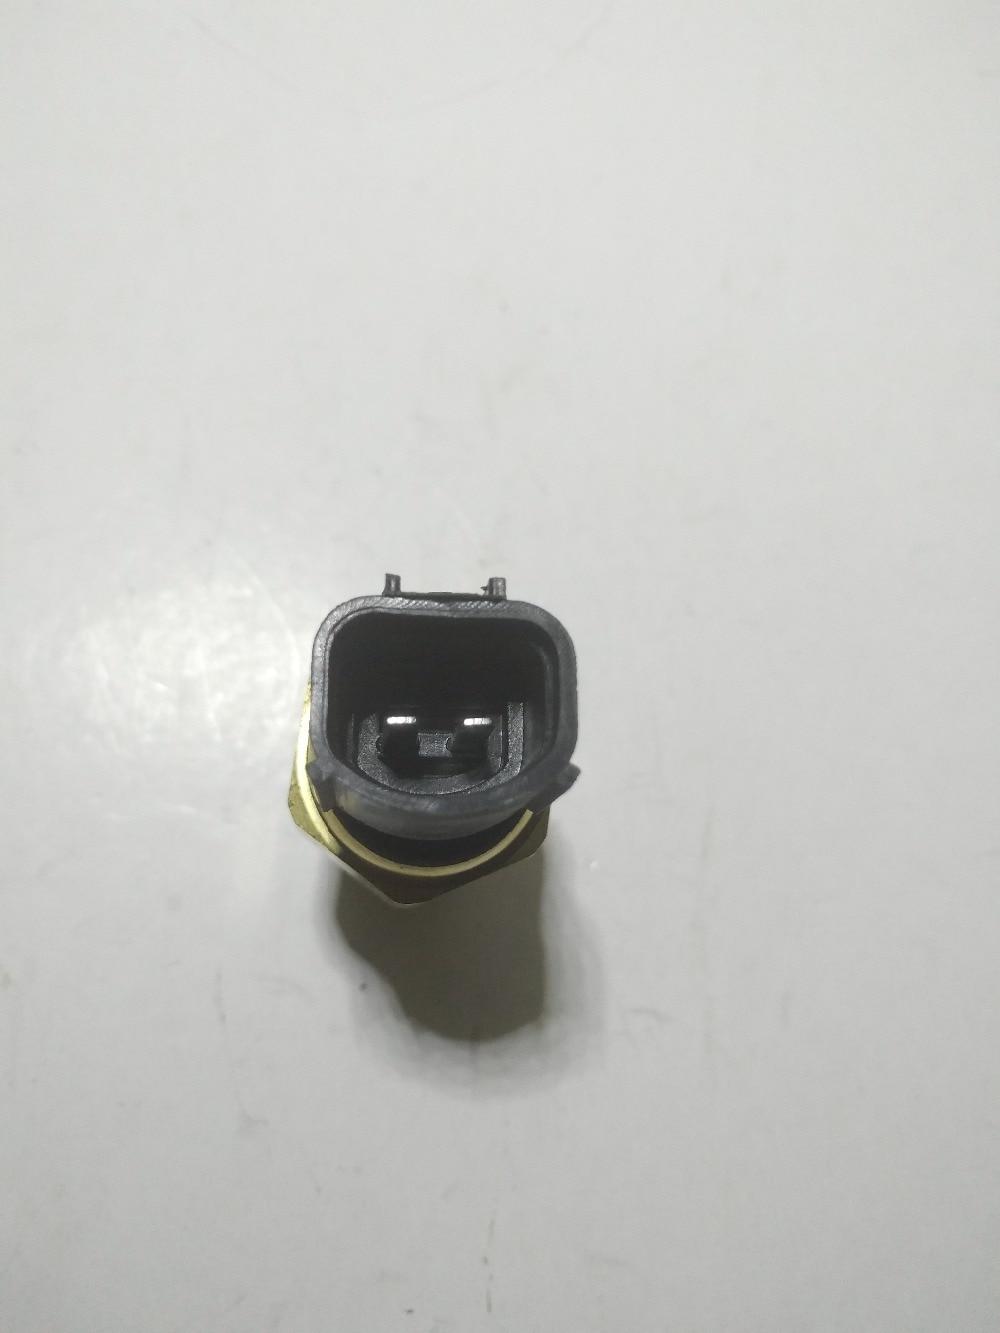 12 месяцев Гарантия качества датчик температуры для hyundai, Kia OE No.: 25360-37100,25360-34000,25360-M2000